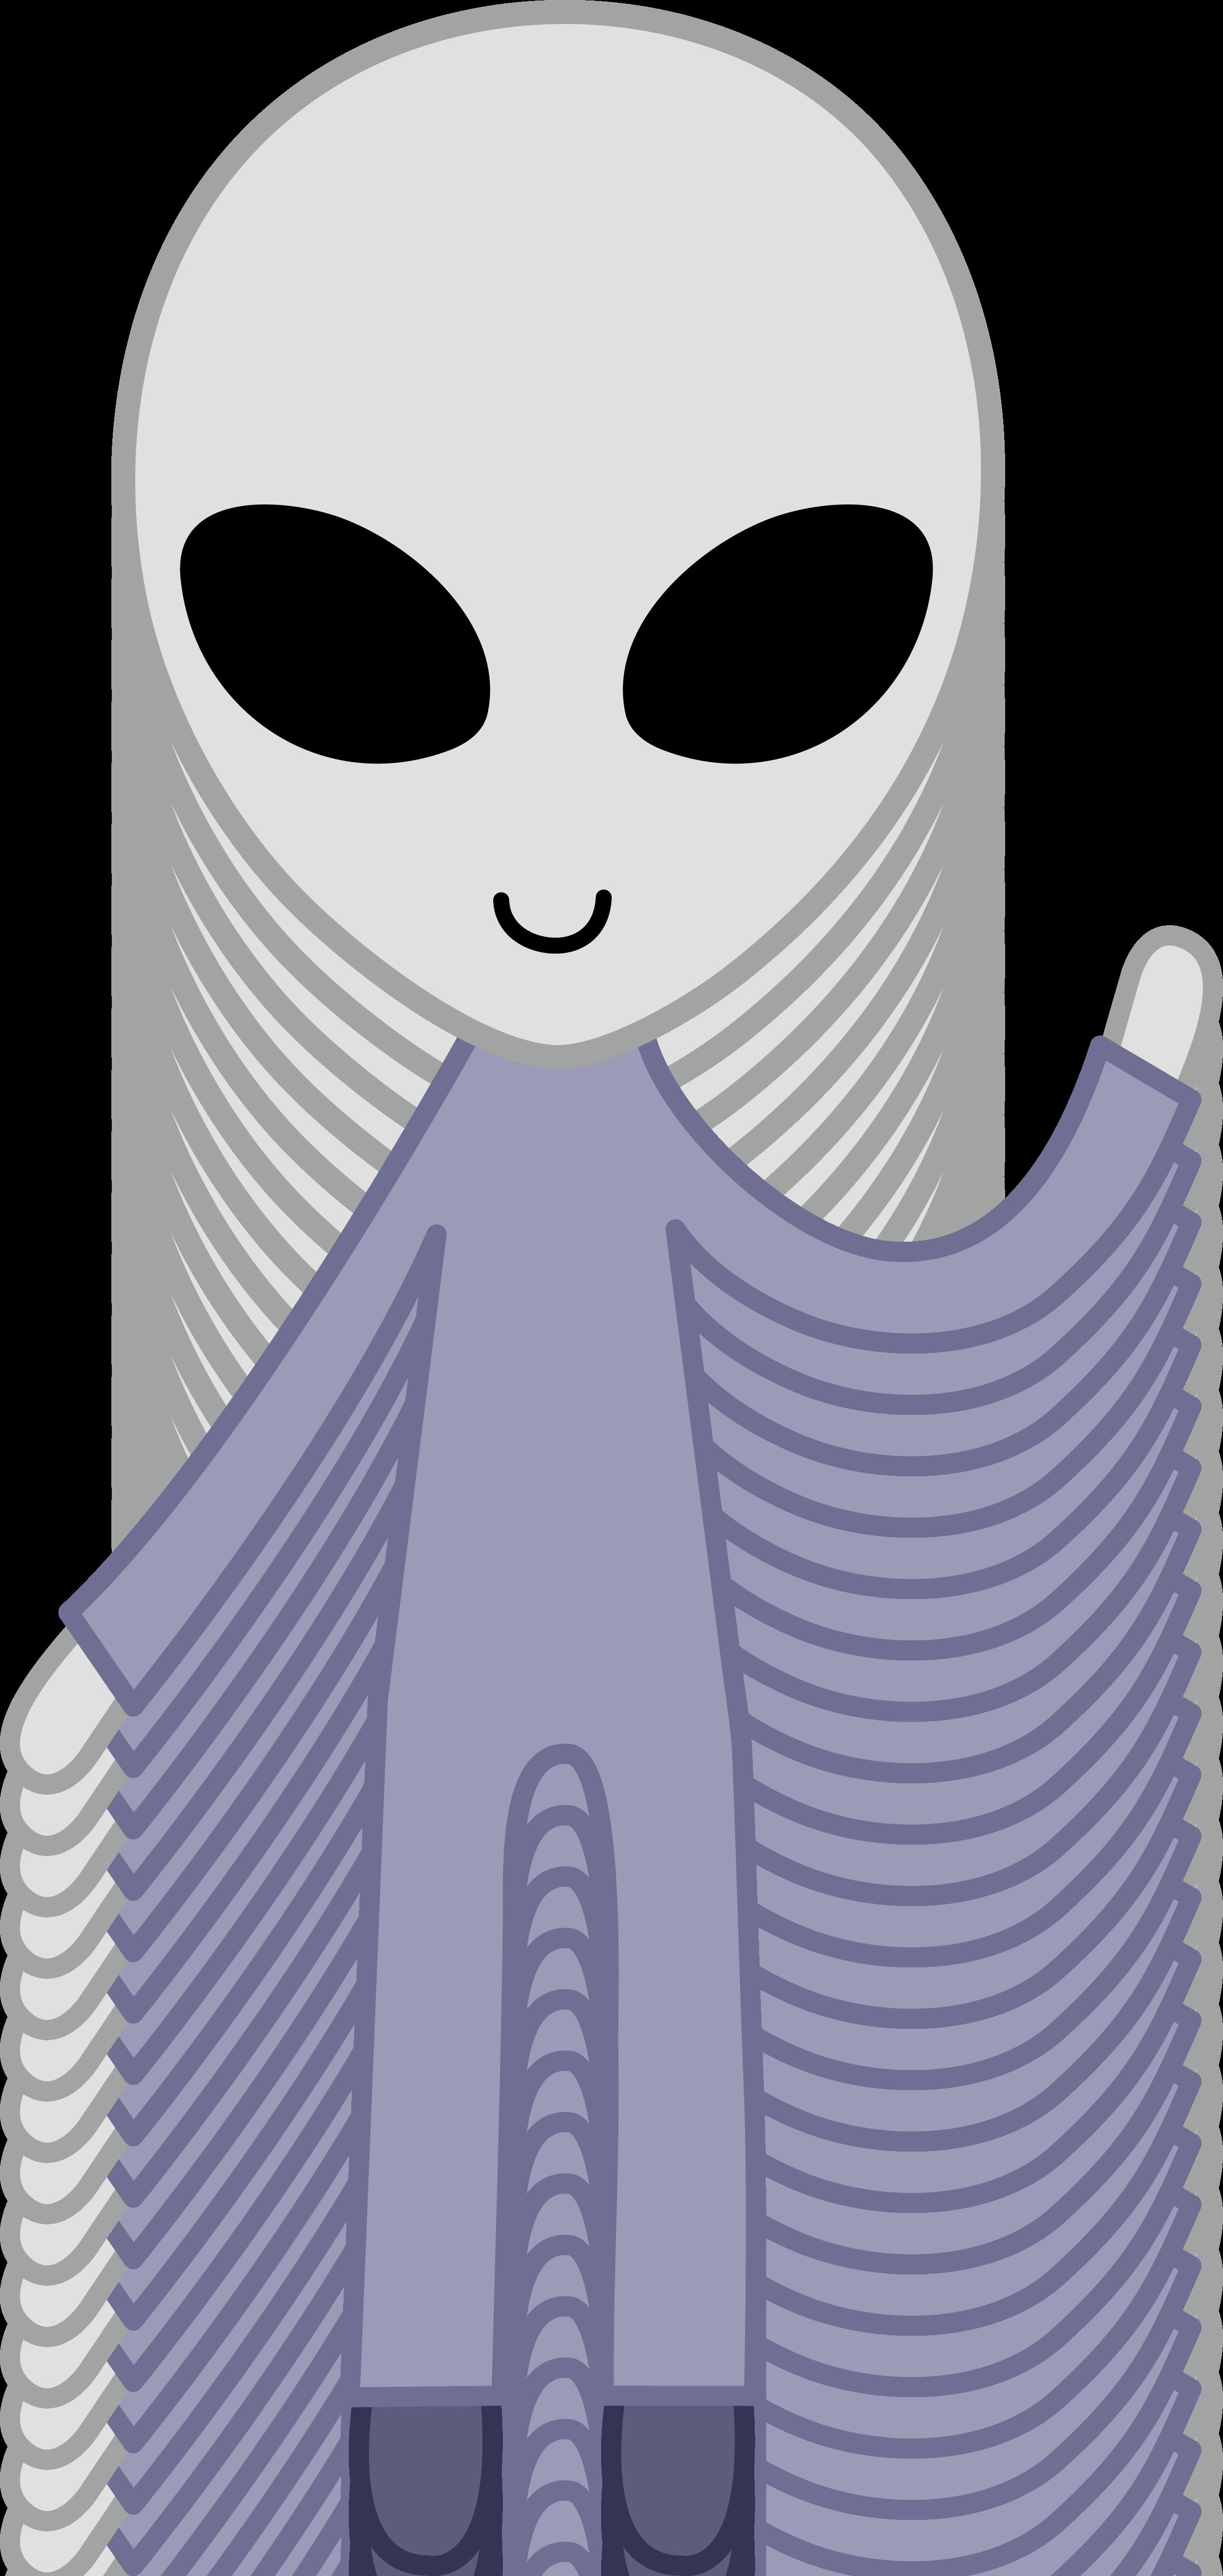 Clipart smile border. Friendly grey space alien